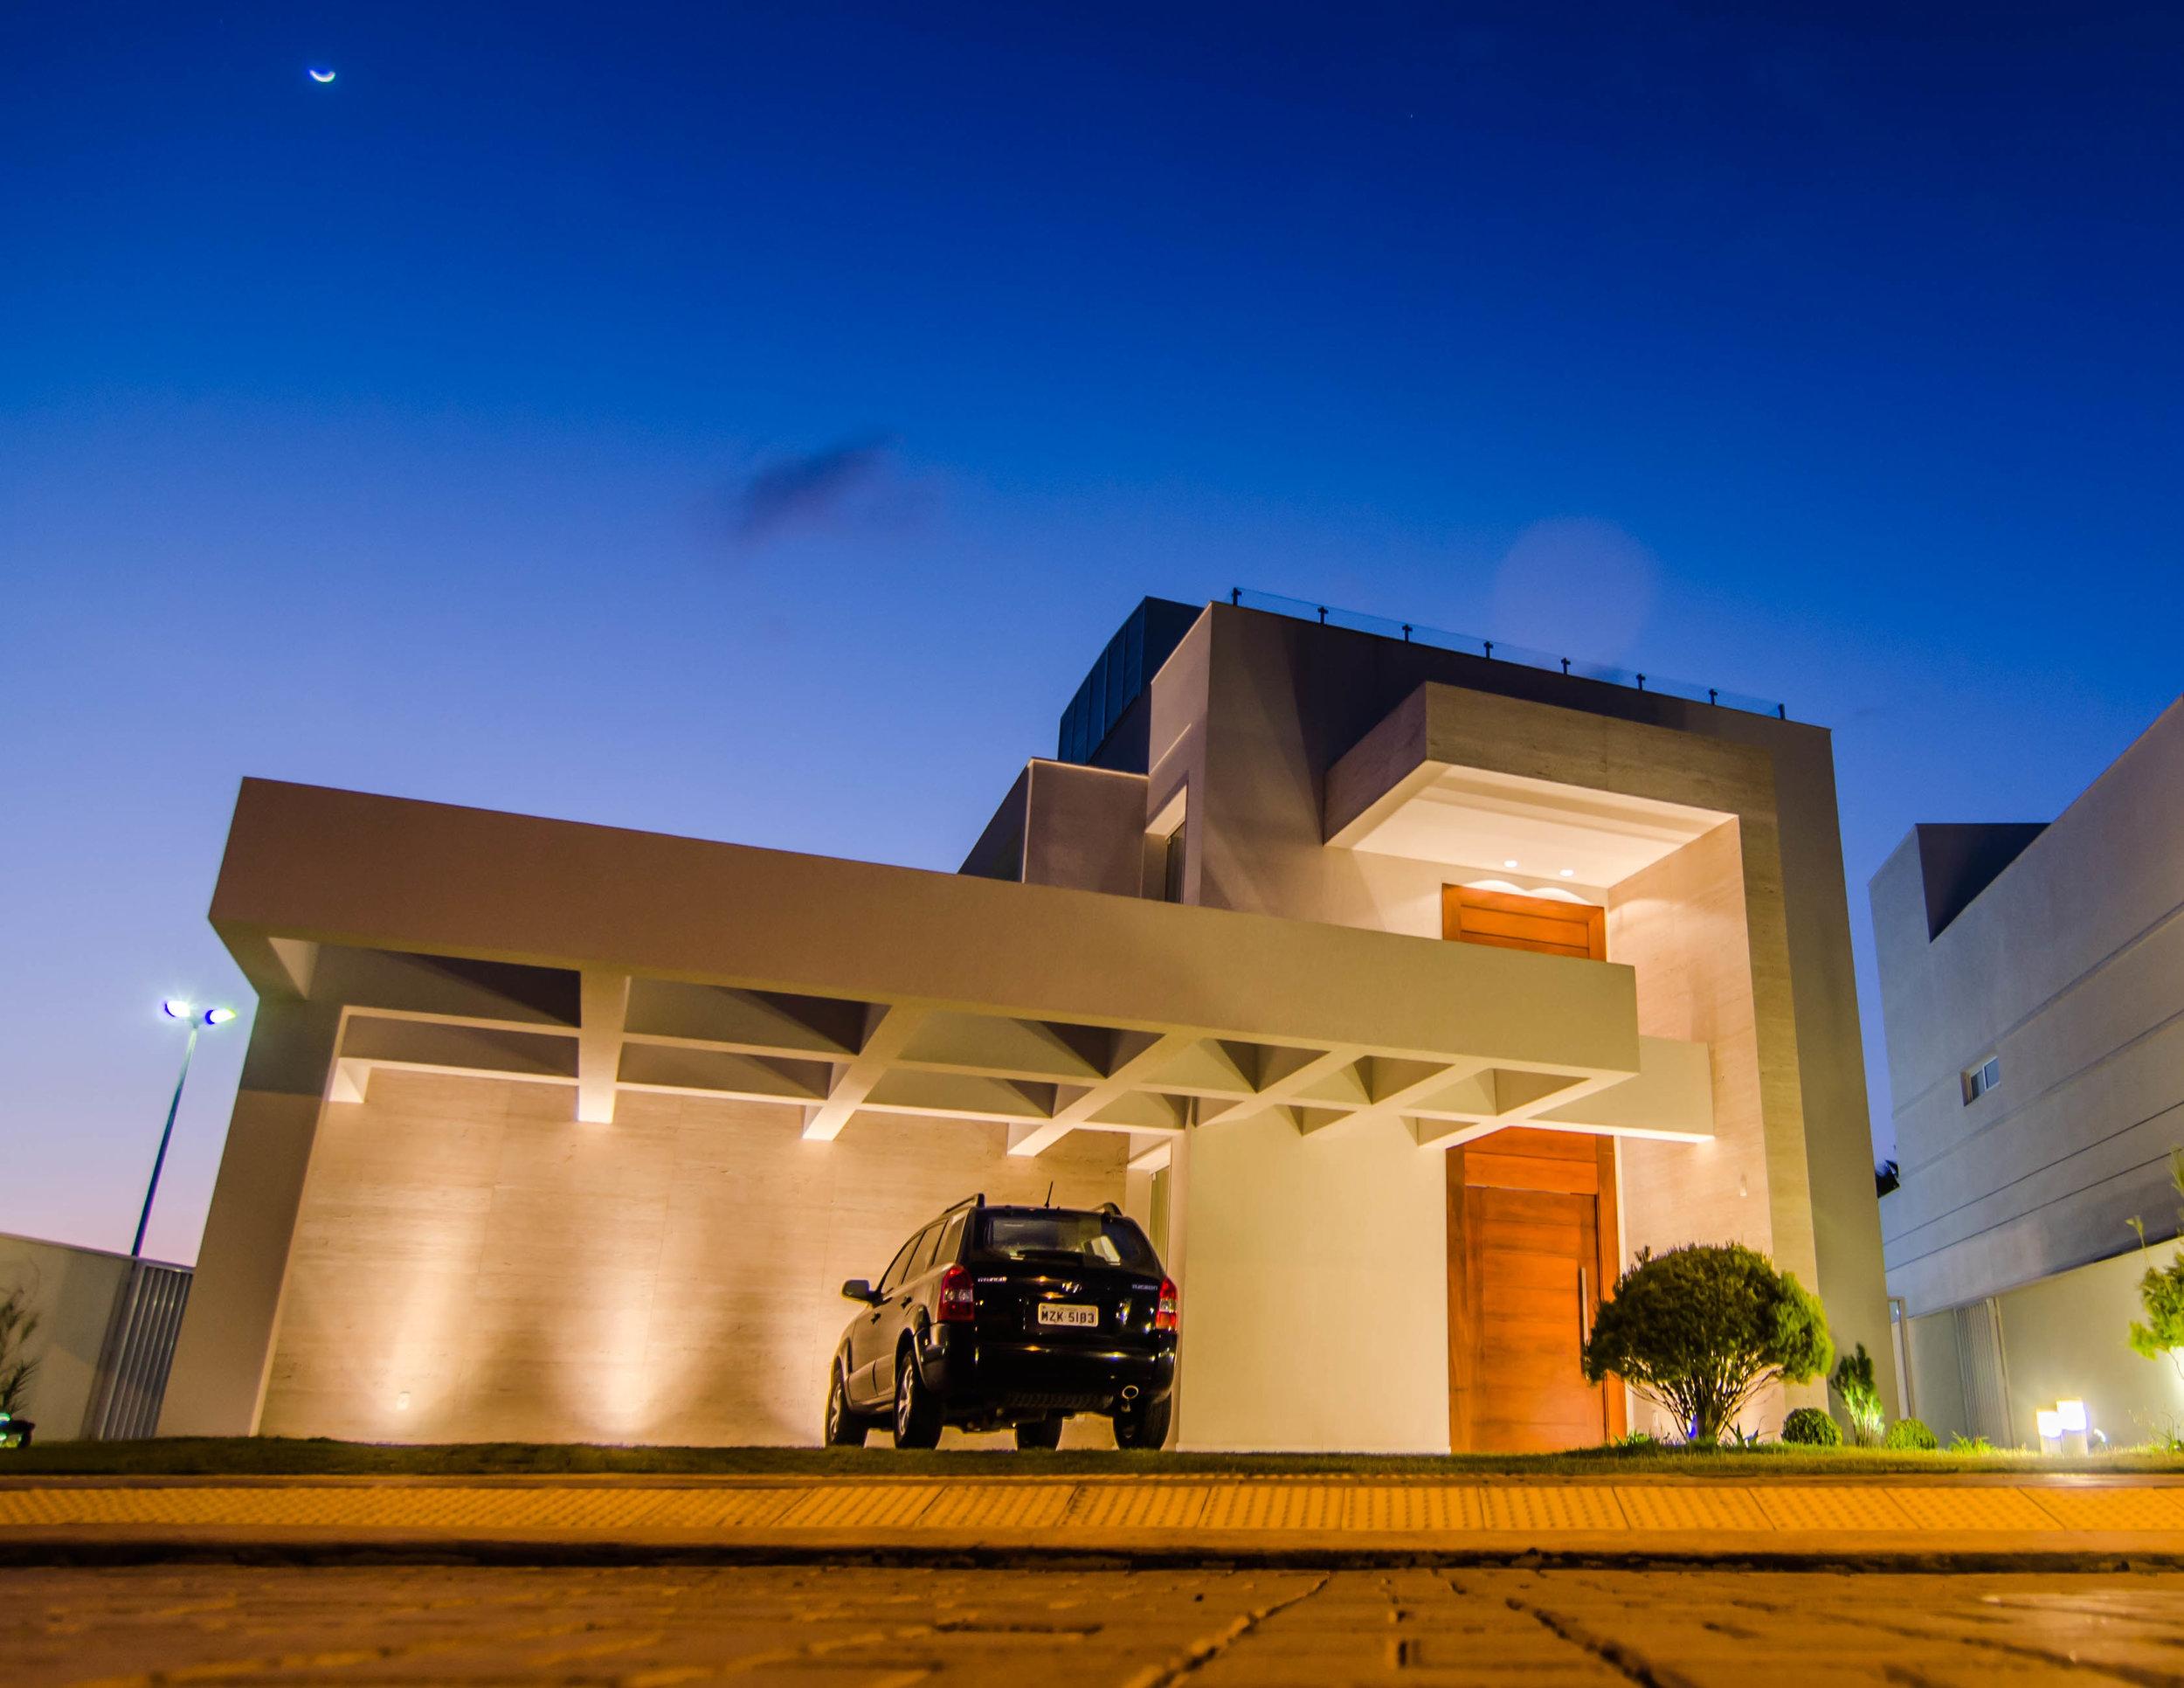 projeto-arquitetonico-edenio-duo-arquitetura-casa-015.jpg